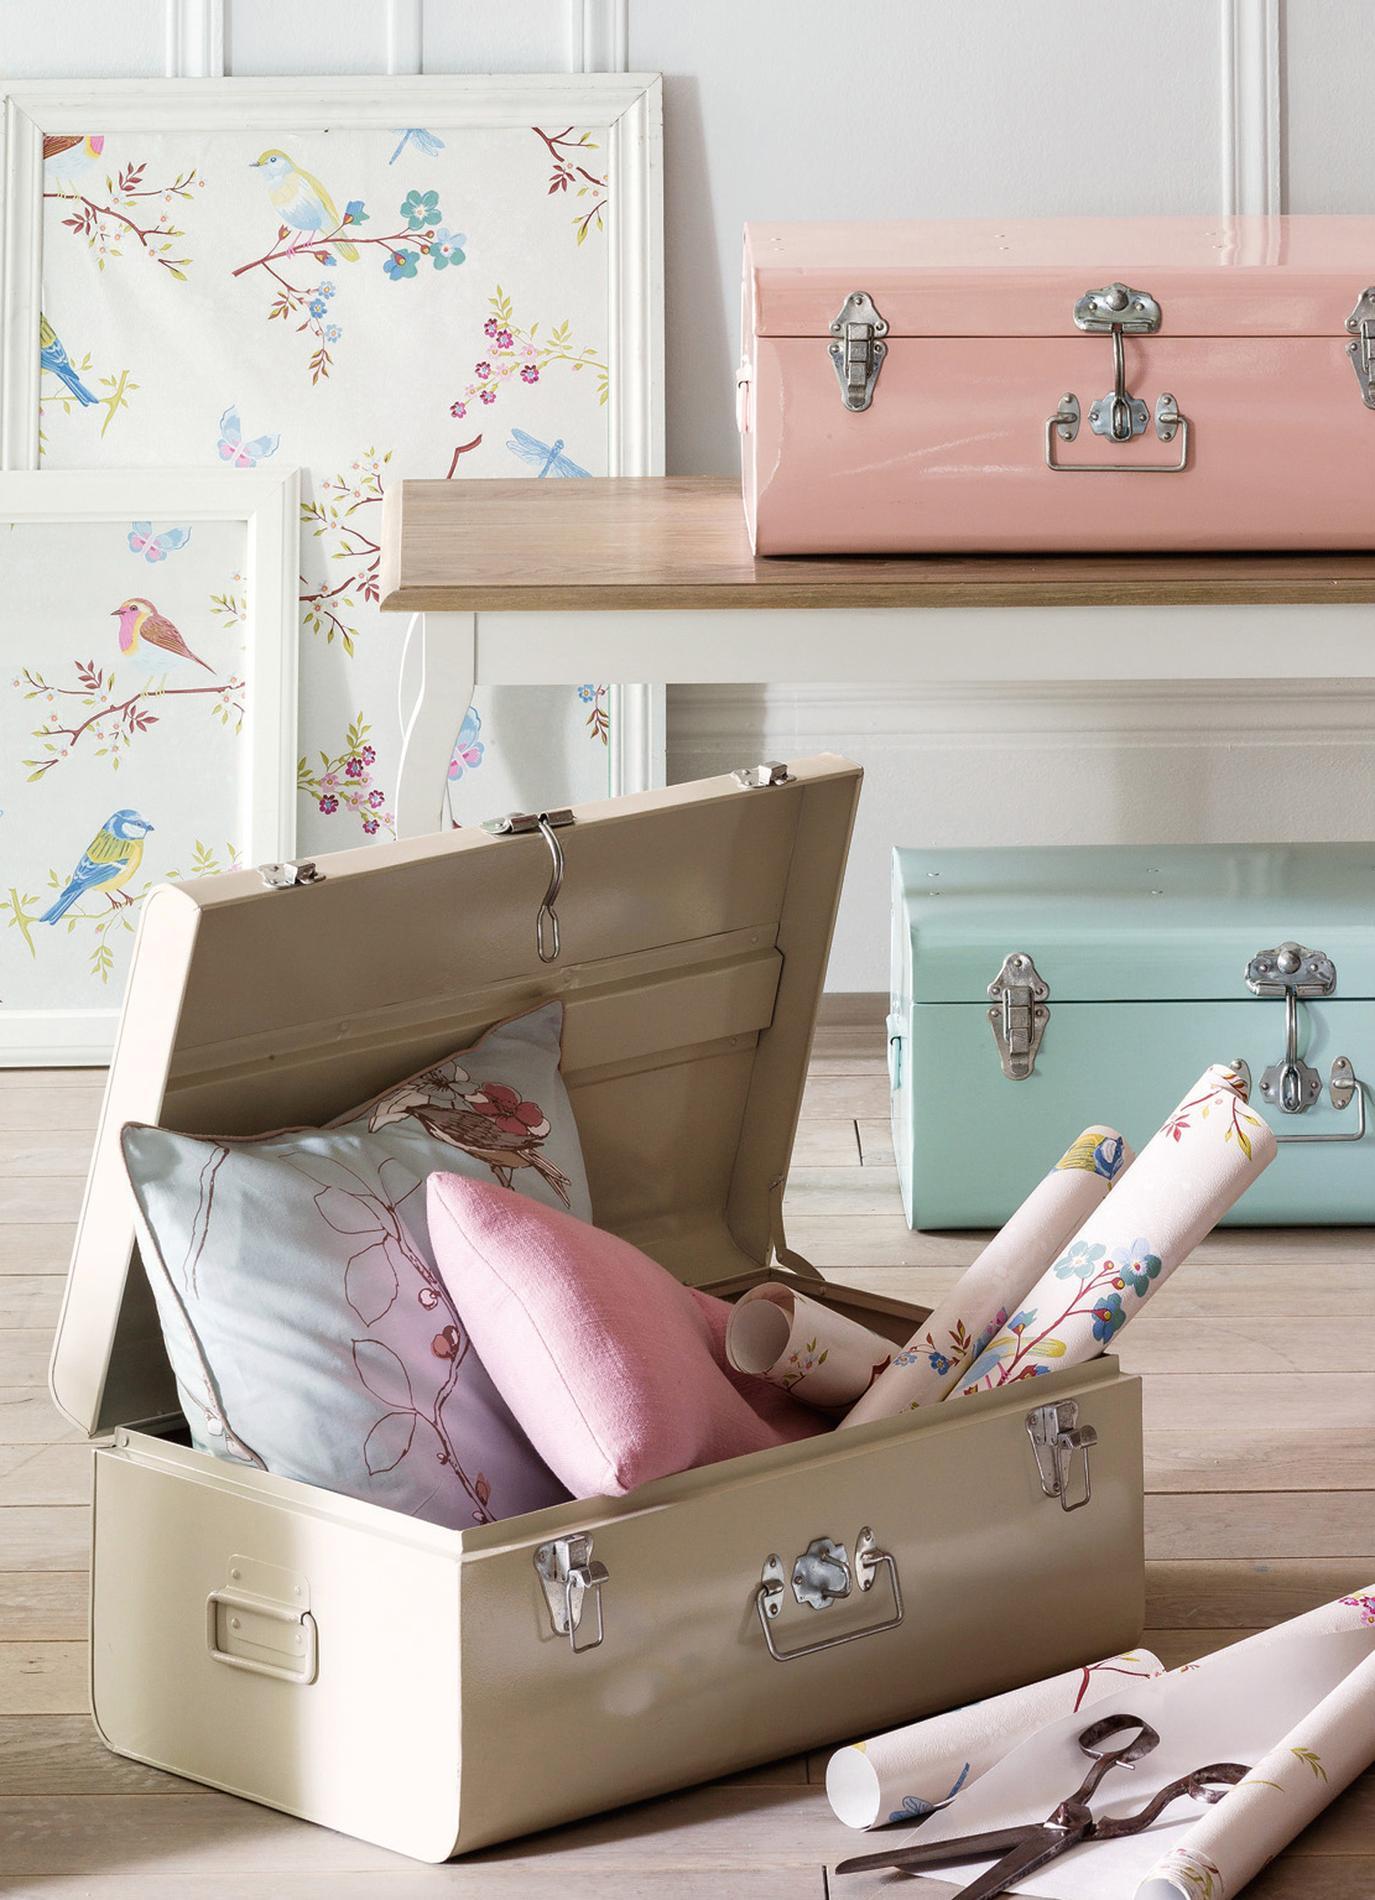 rangement 20 solutions esth tiques et astucieuses qui sortent du placard le figaro madame. Black Bedroom Furniture Sets. Home Design Ideas